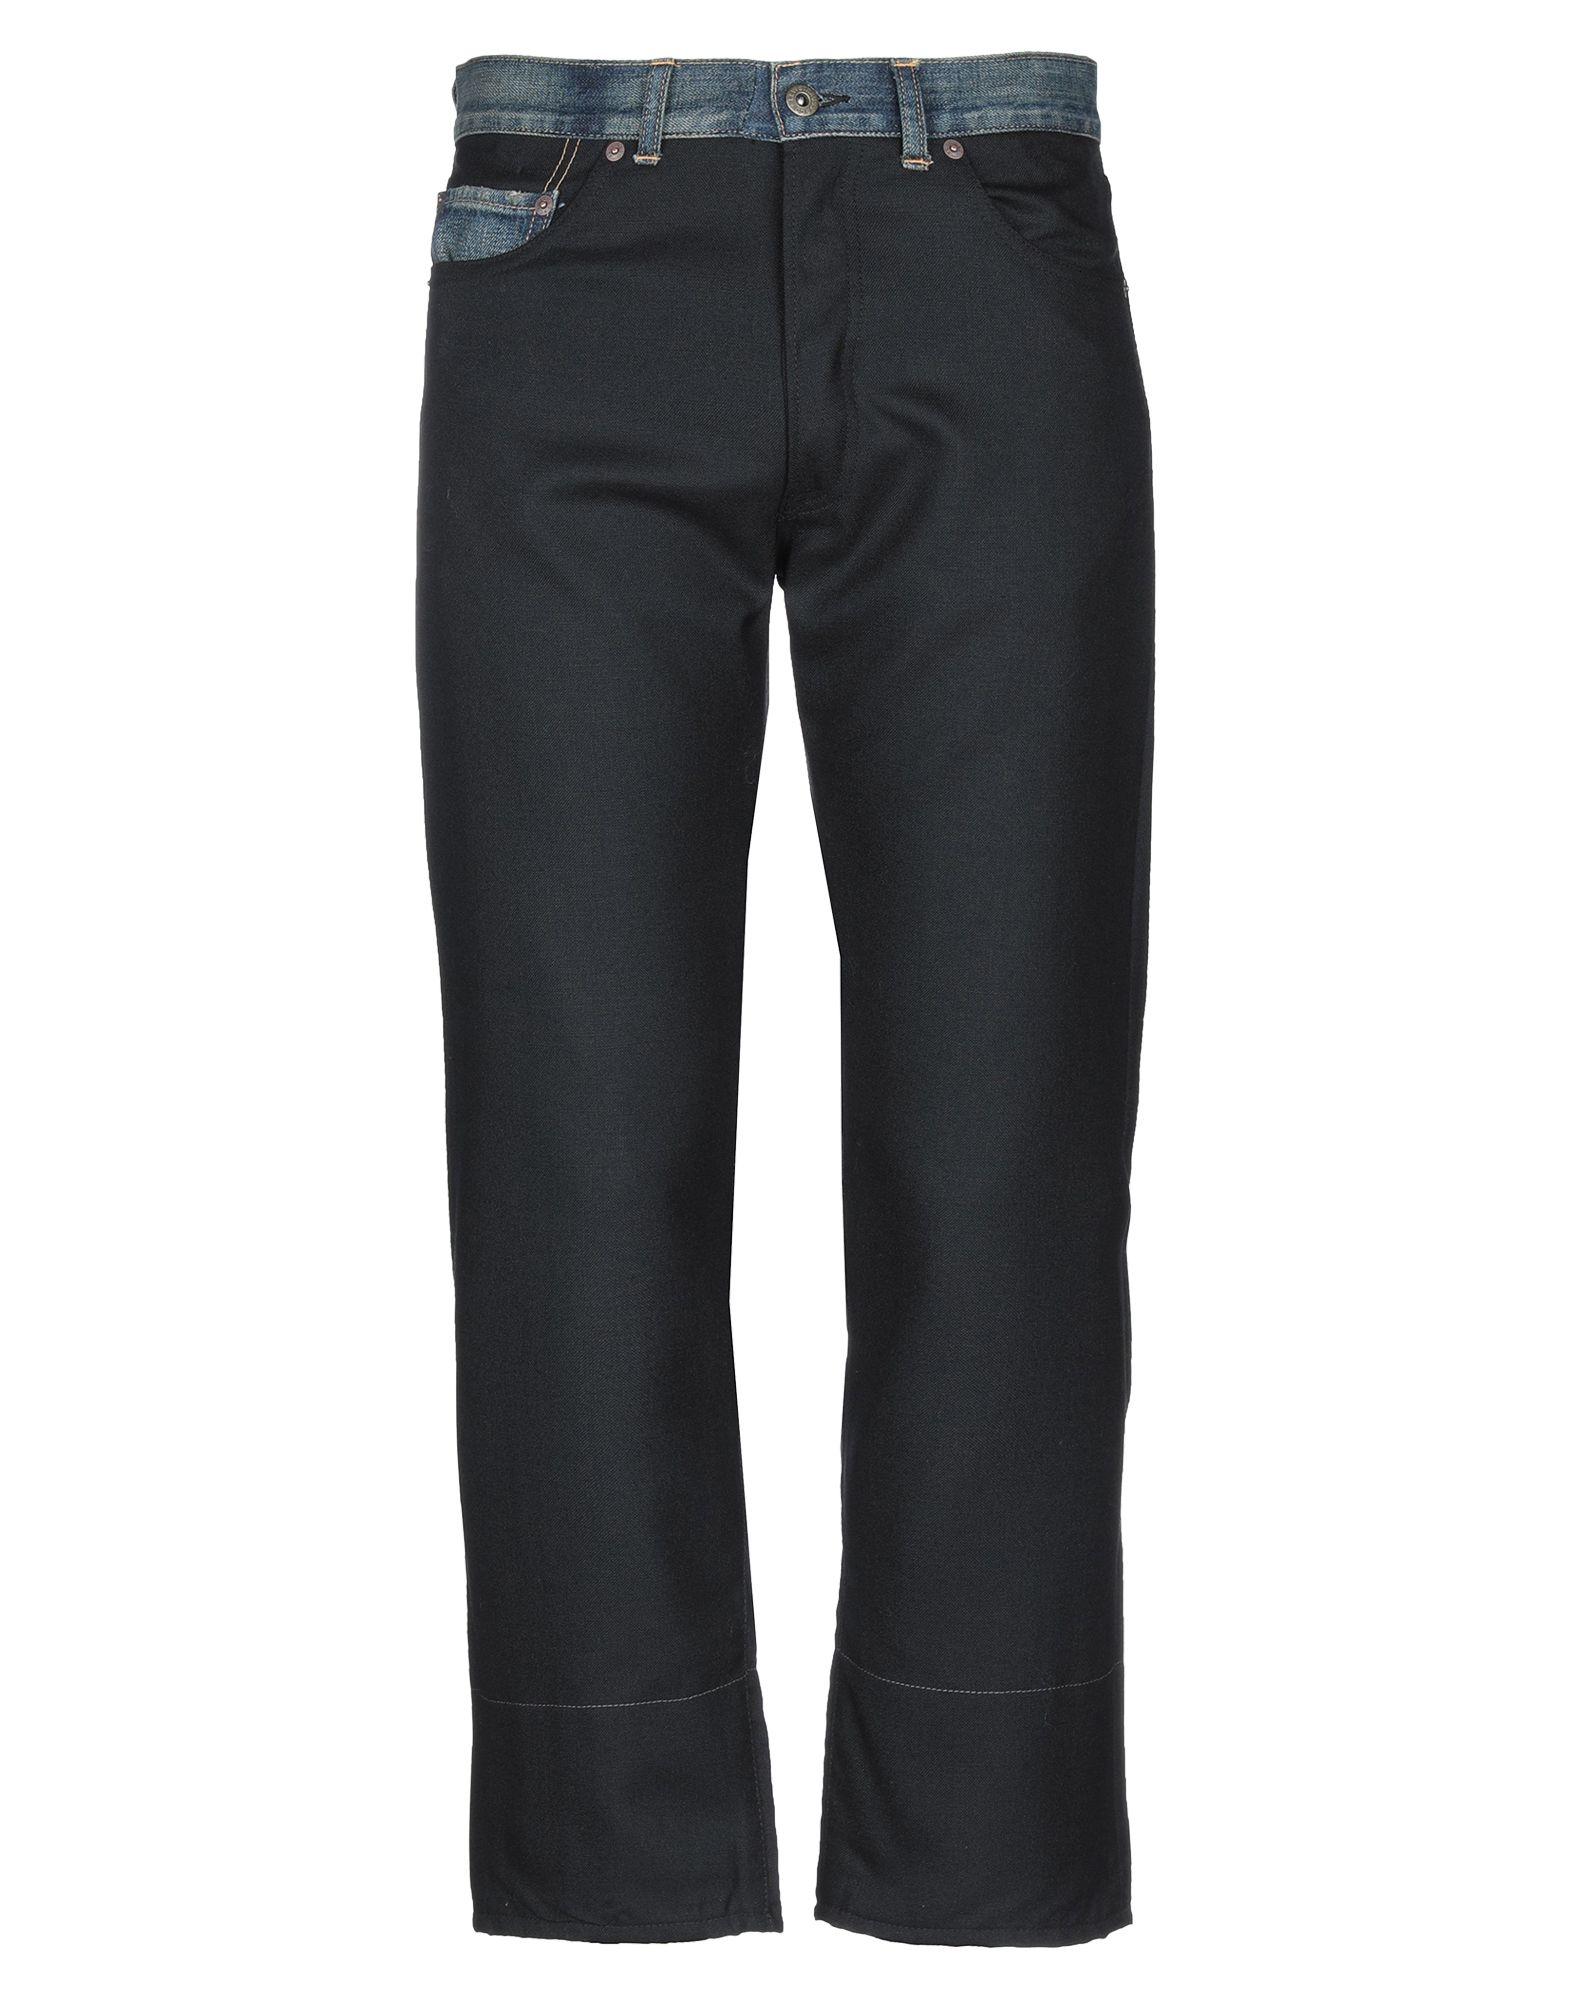 JUNYA WATANABE COMME des GARÇONS MAN X LEVI'S Повседневные брюки